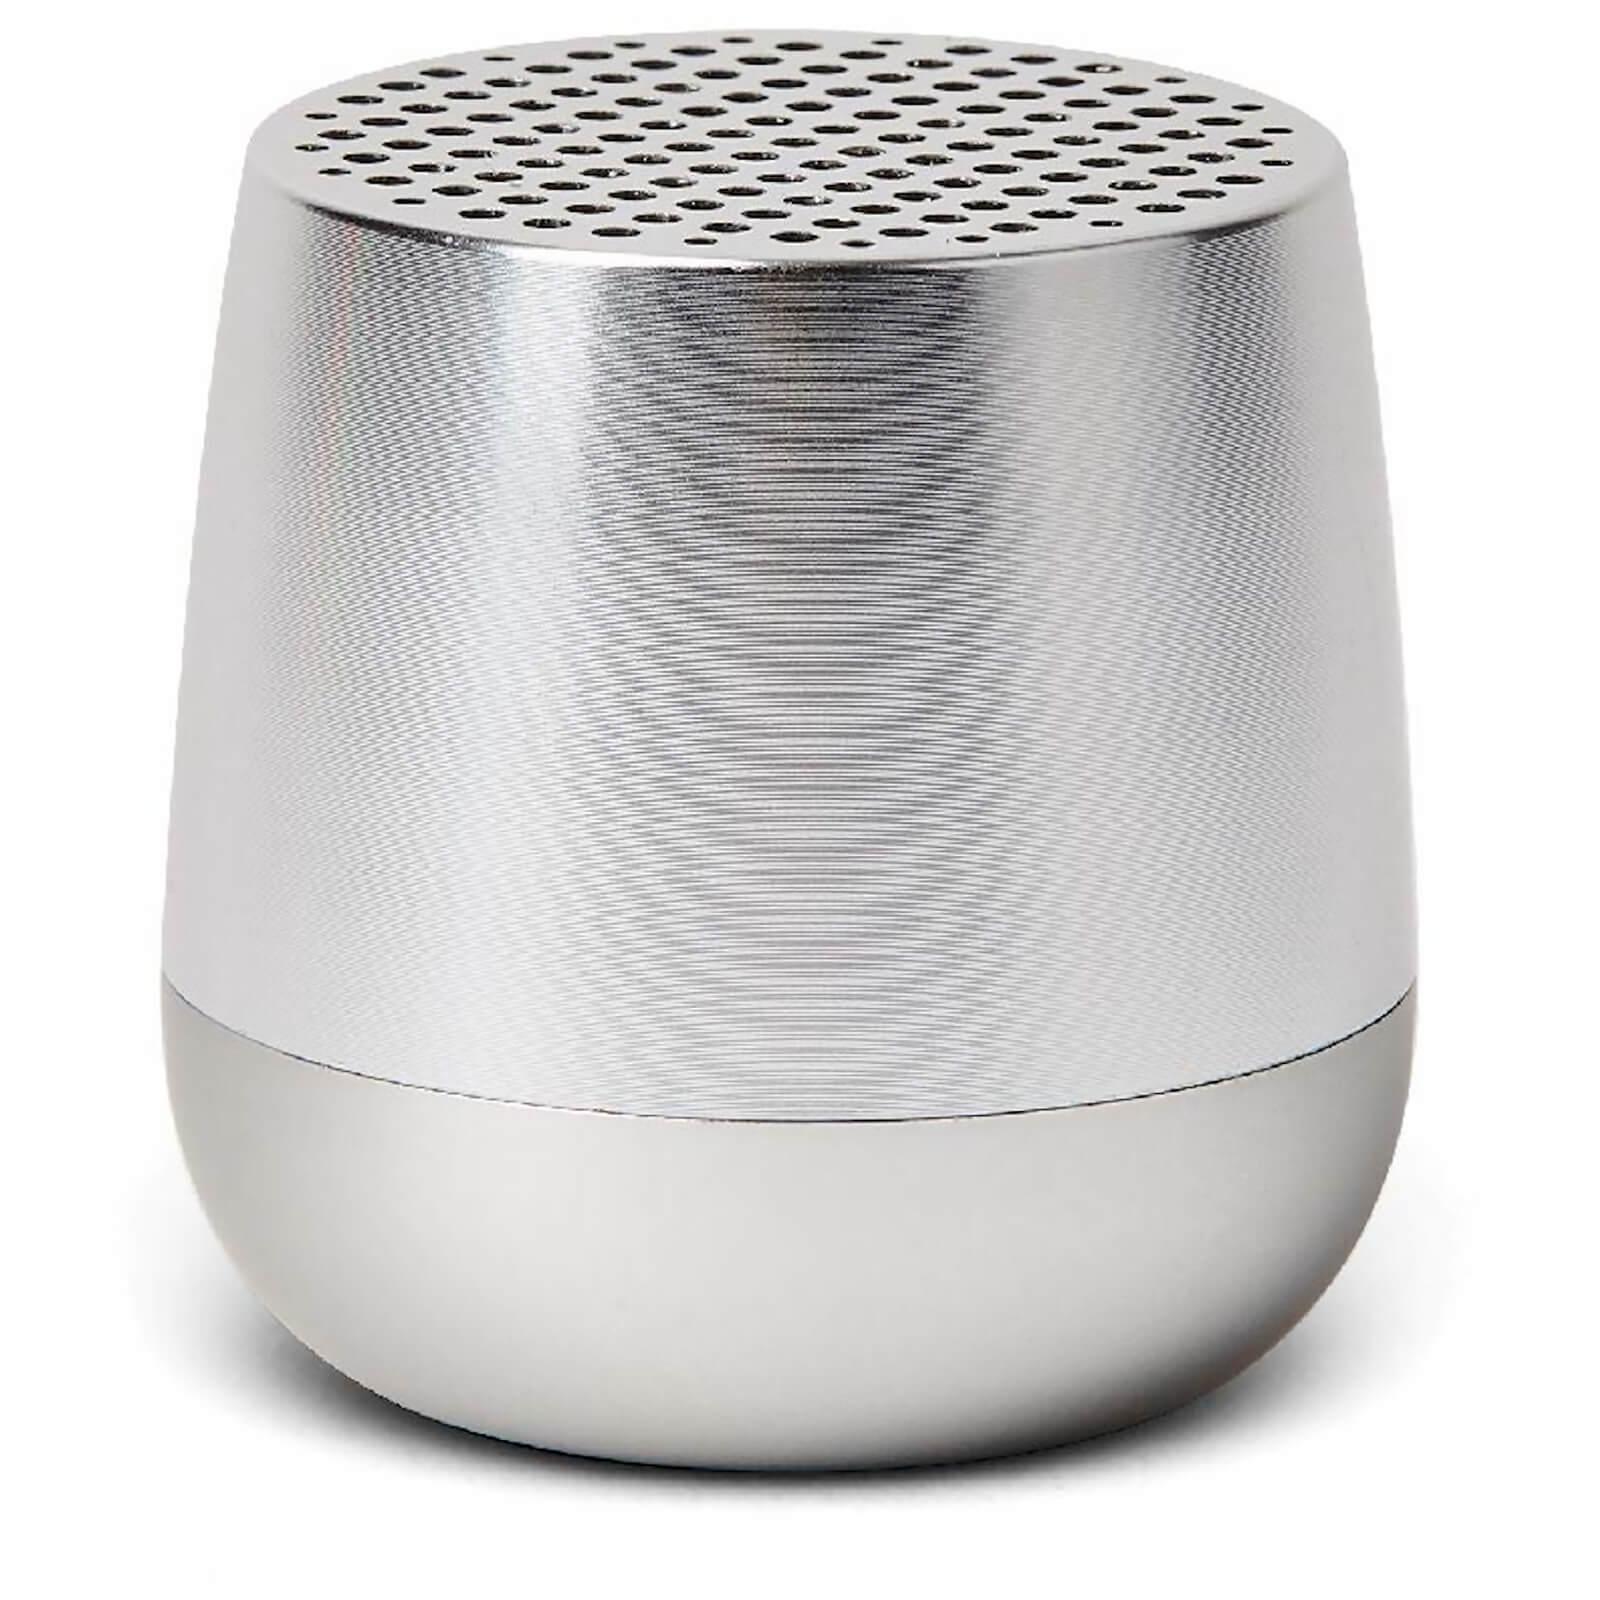 Lexon MINO Bluetooth Speaker - Polish Aluminium